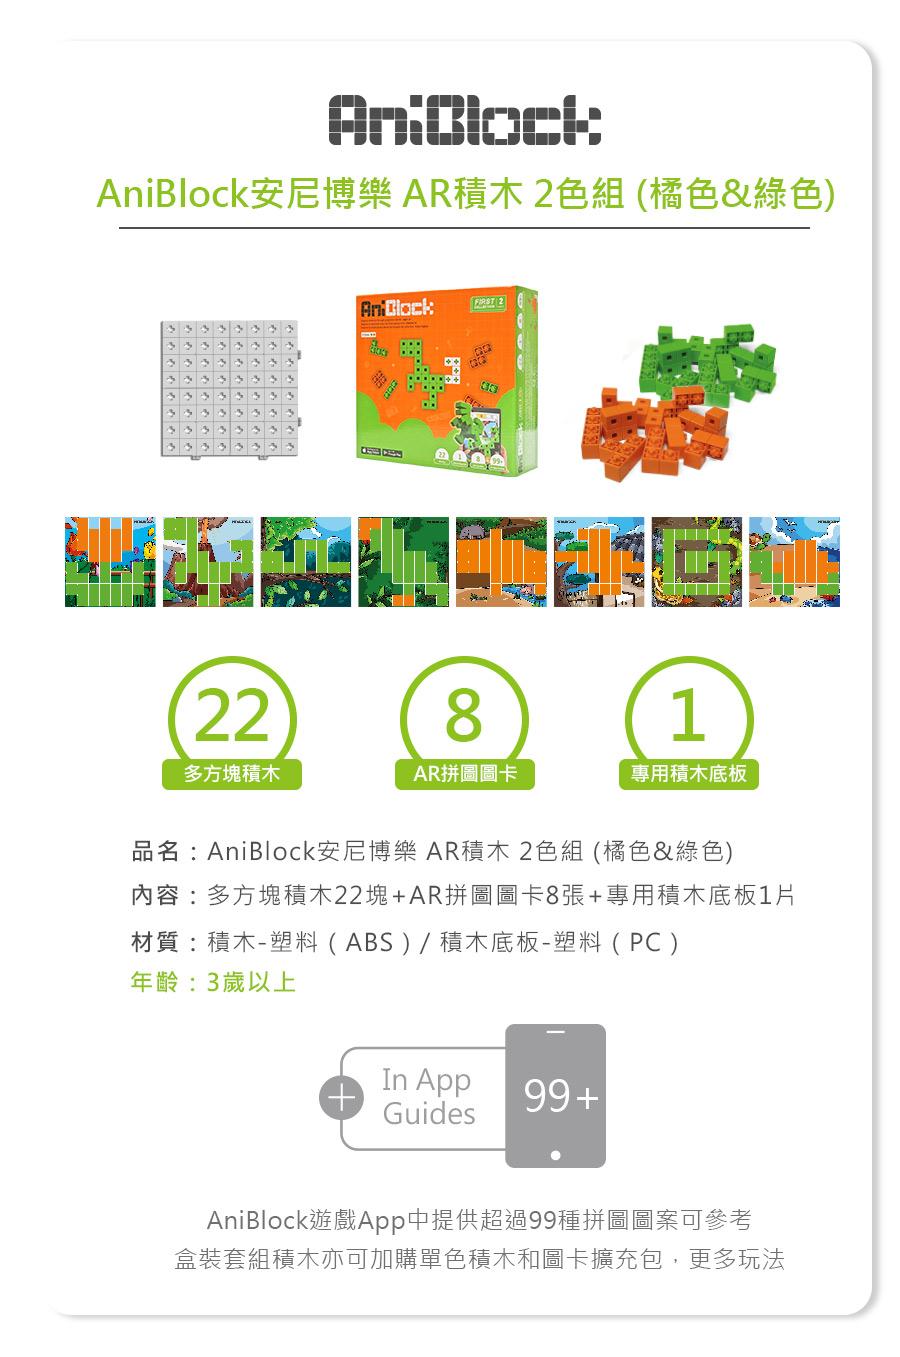 AniBlock AR積木拼圖 2色 橘綠 產品規格介紹